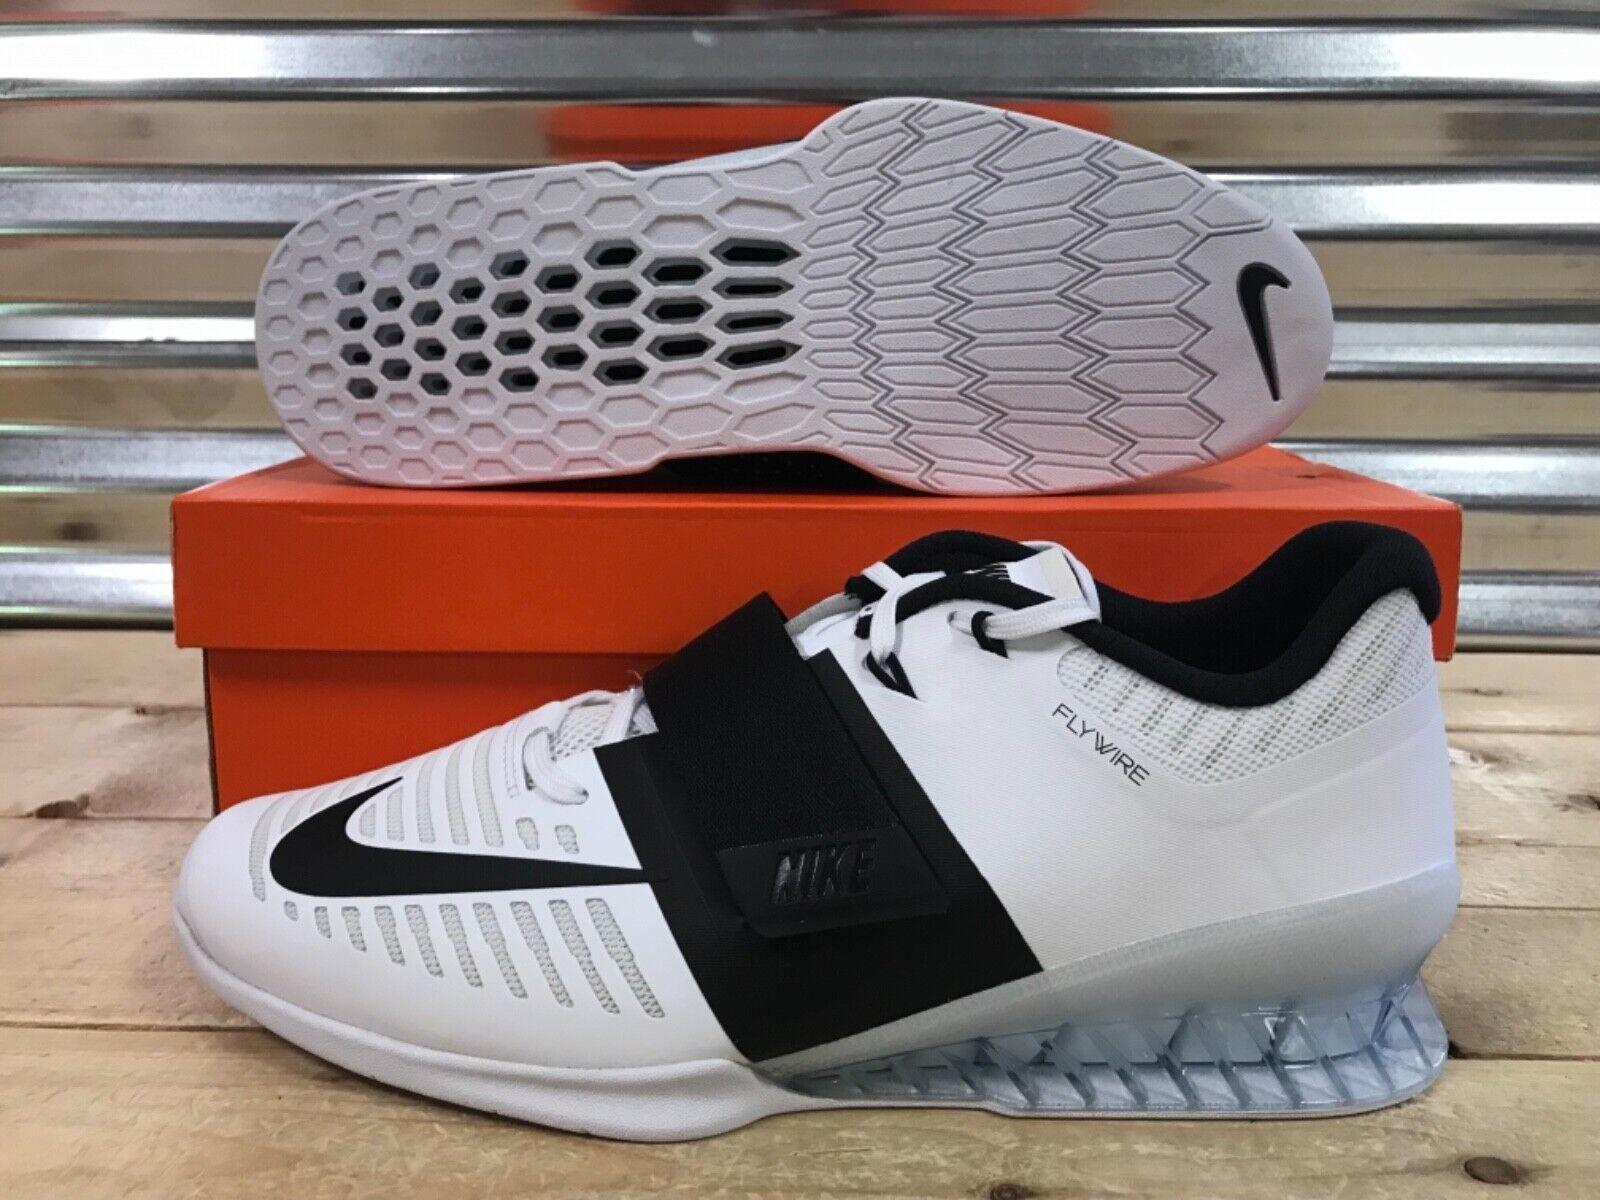 Nike Romaleos 3 3 3 Weightlifting Crossfit Trainer scarpe bianca nero SZ (852933-101) 48bcf9